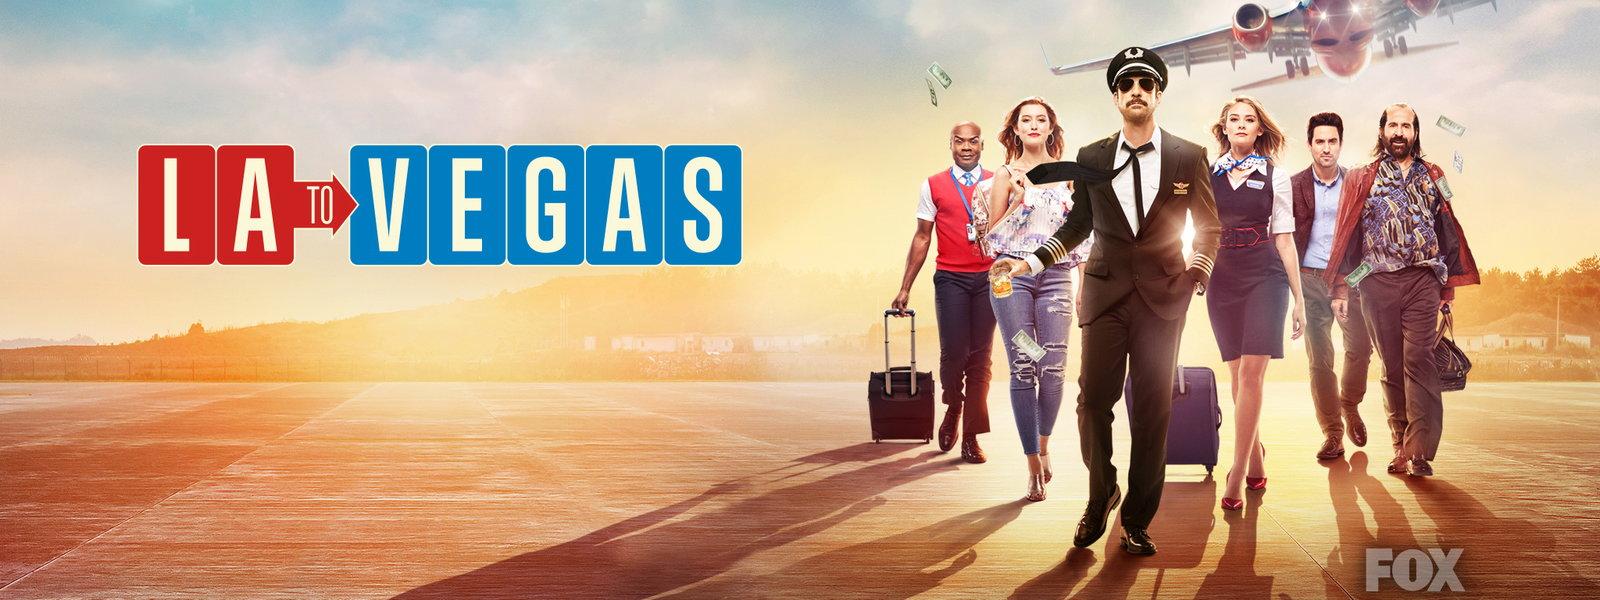 LA to Vegas (1)